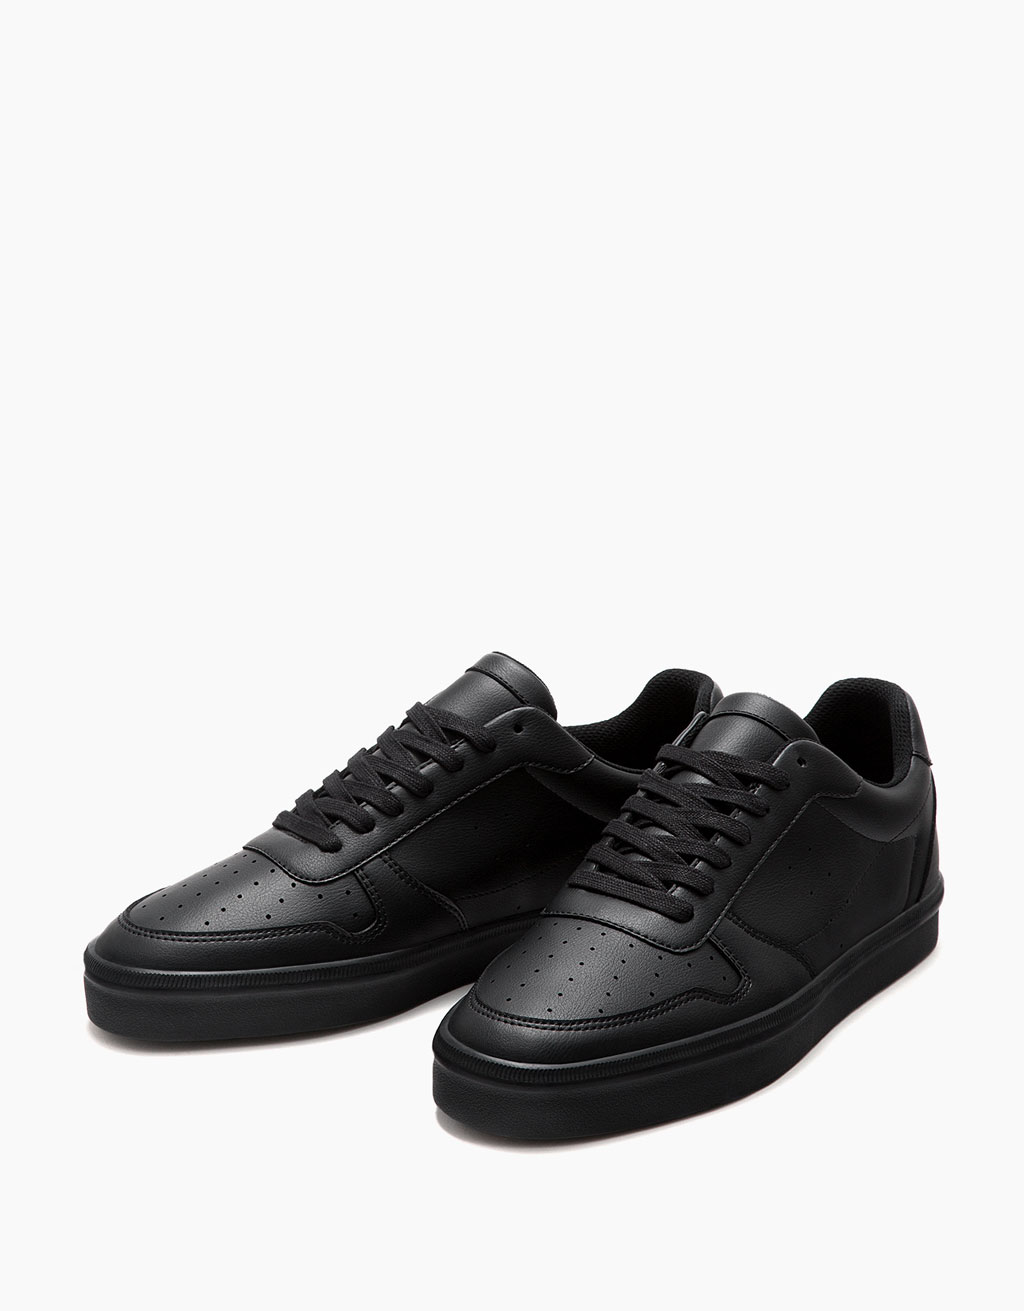 Men's retro topstitched sneakers